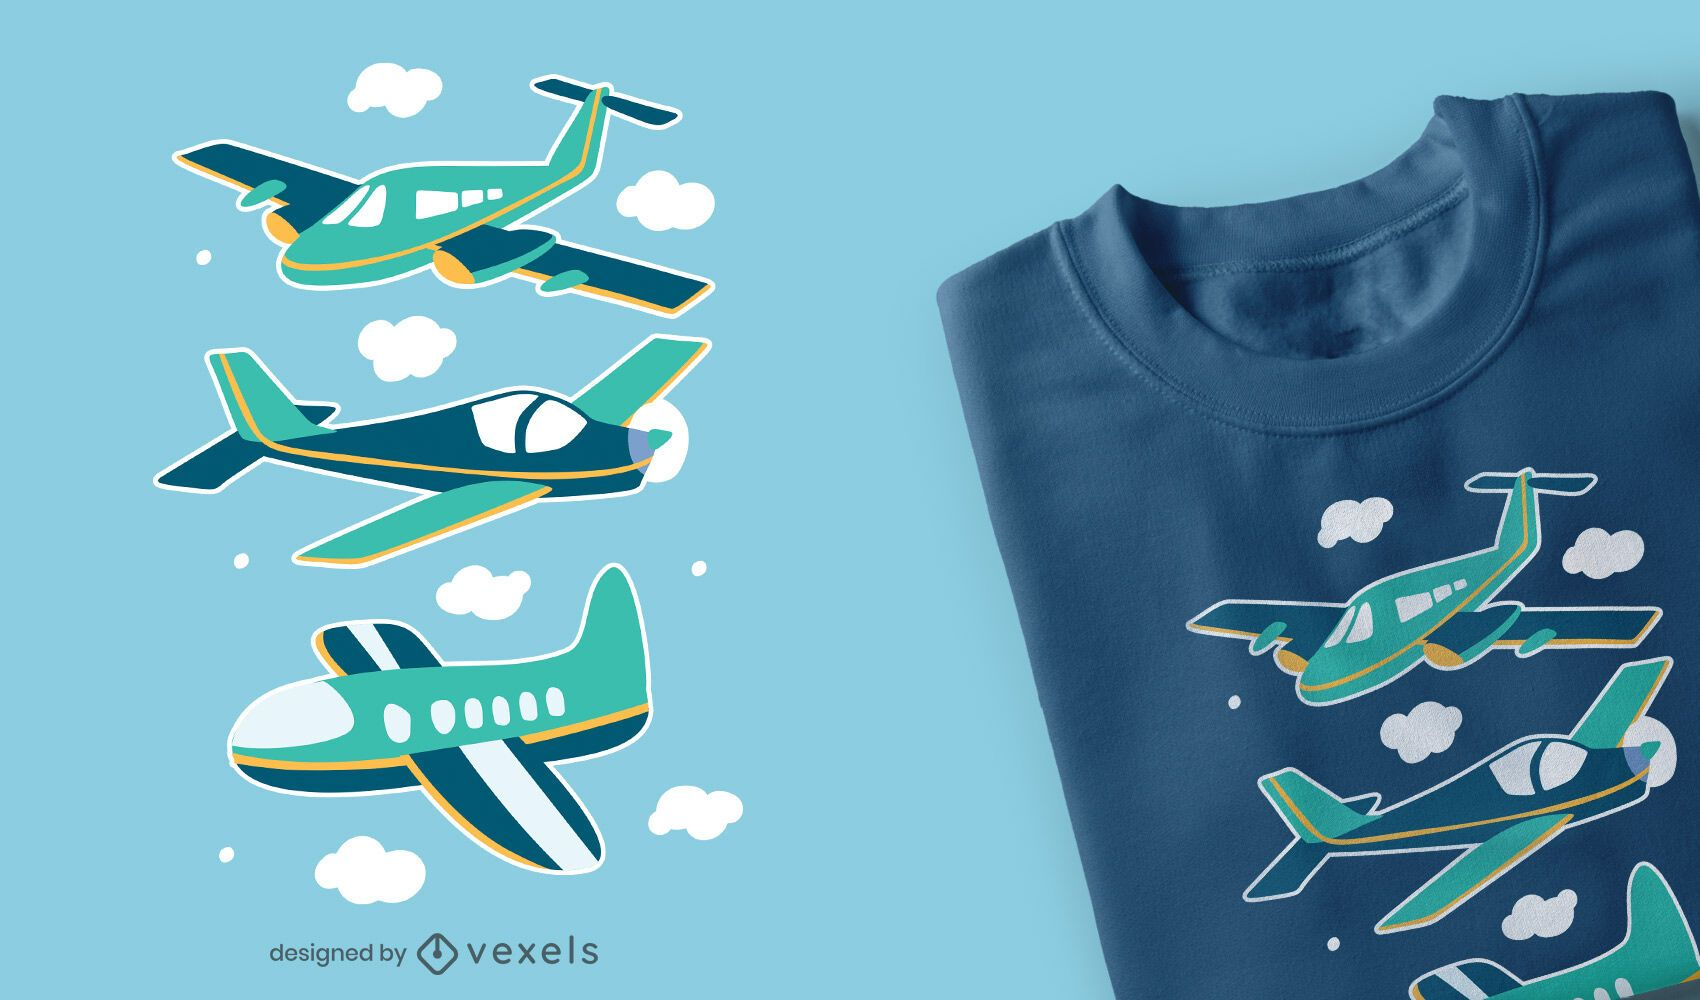 Airplanes t-shirt design